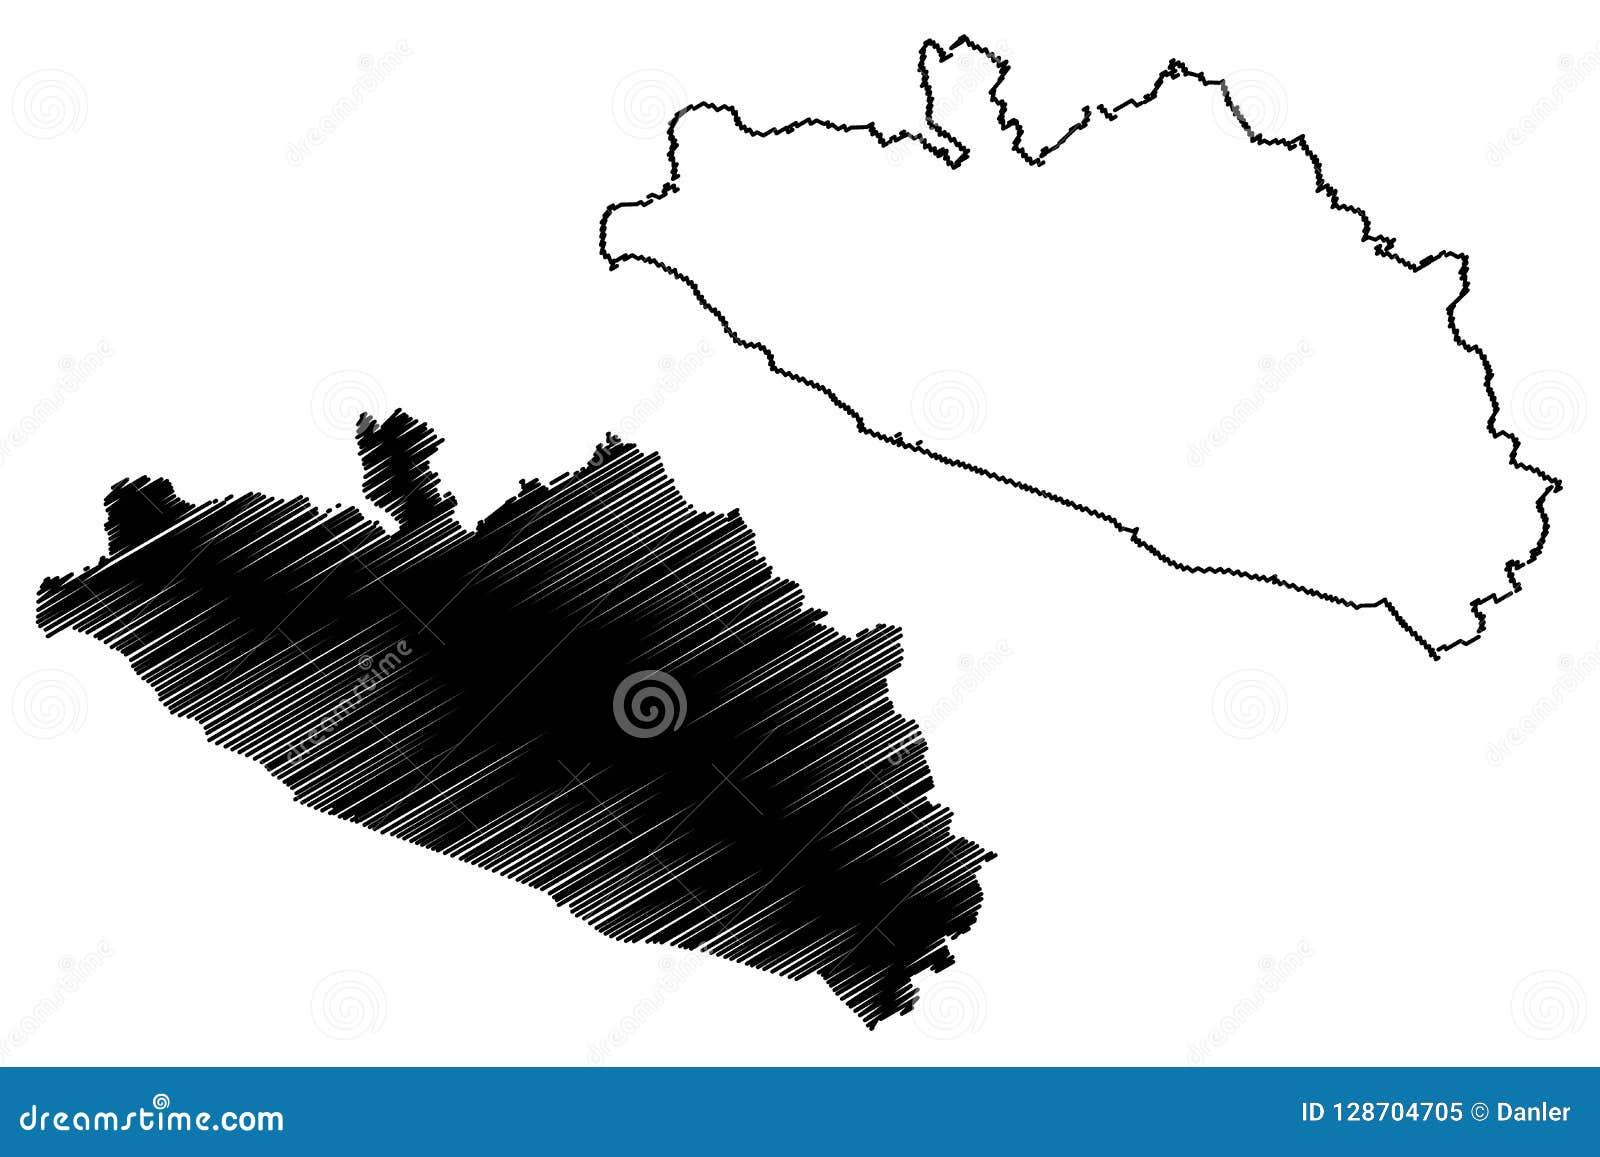 Guerrero map vector stock vector. Illustration of mexico ...